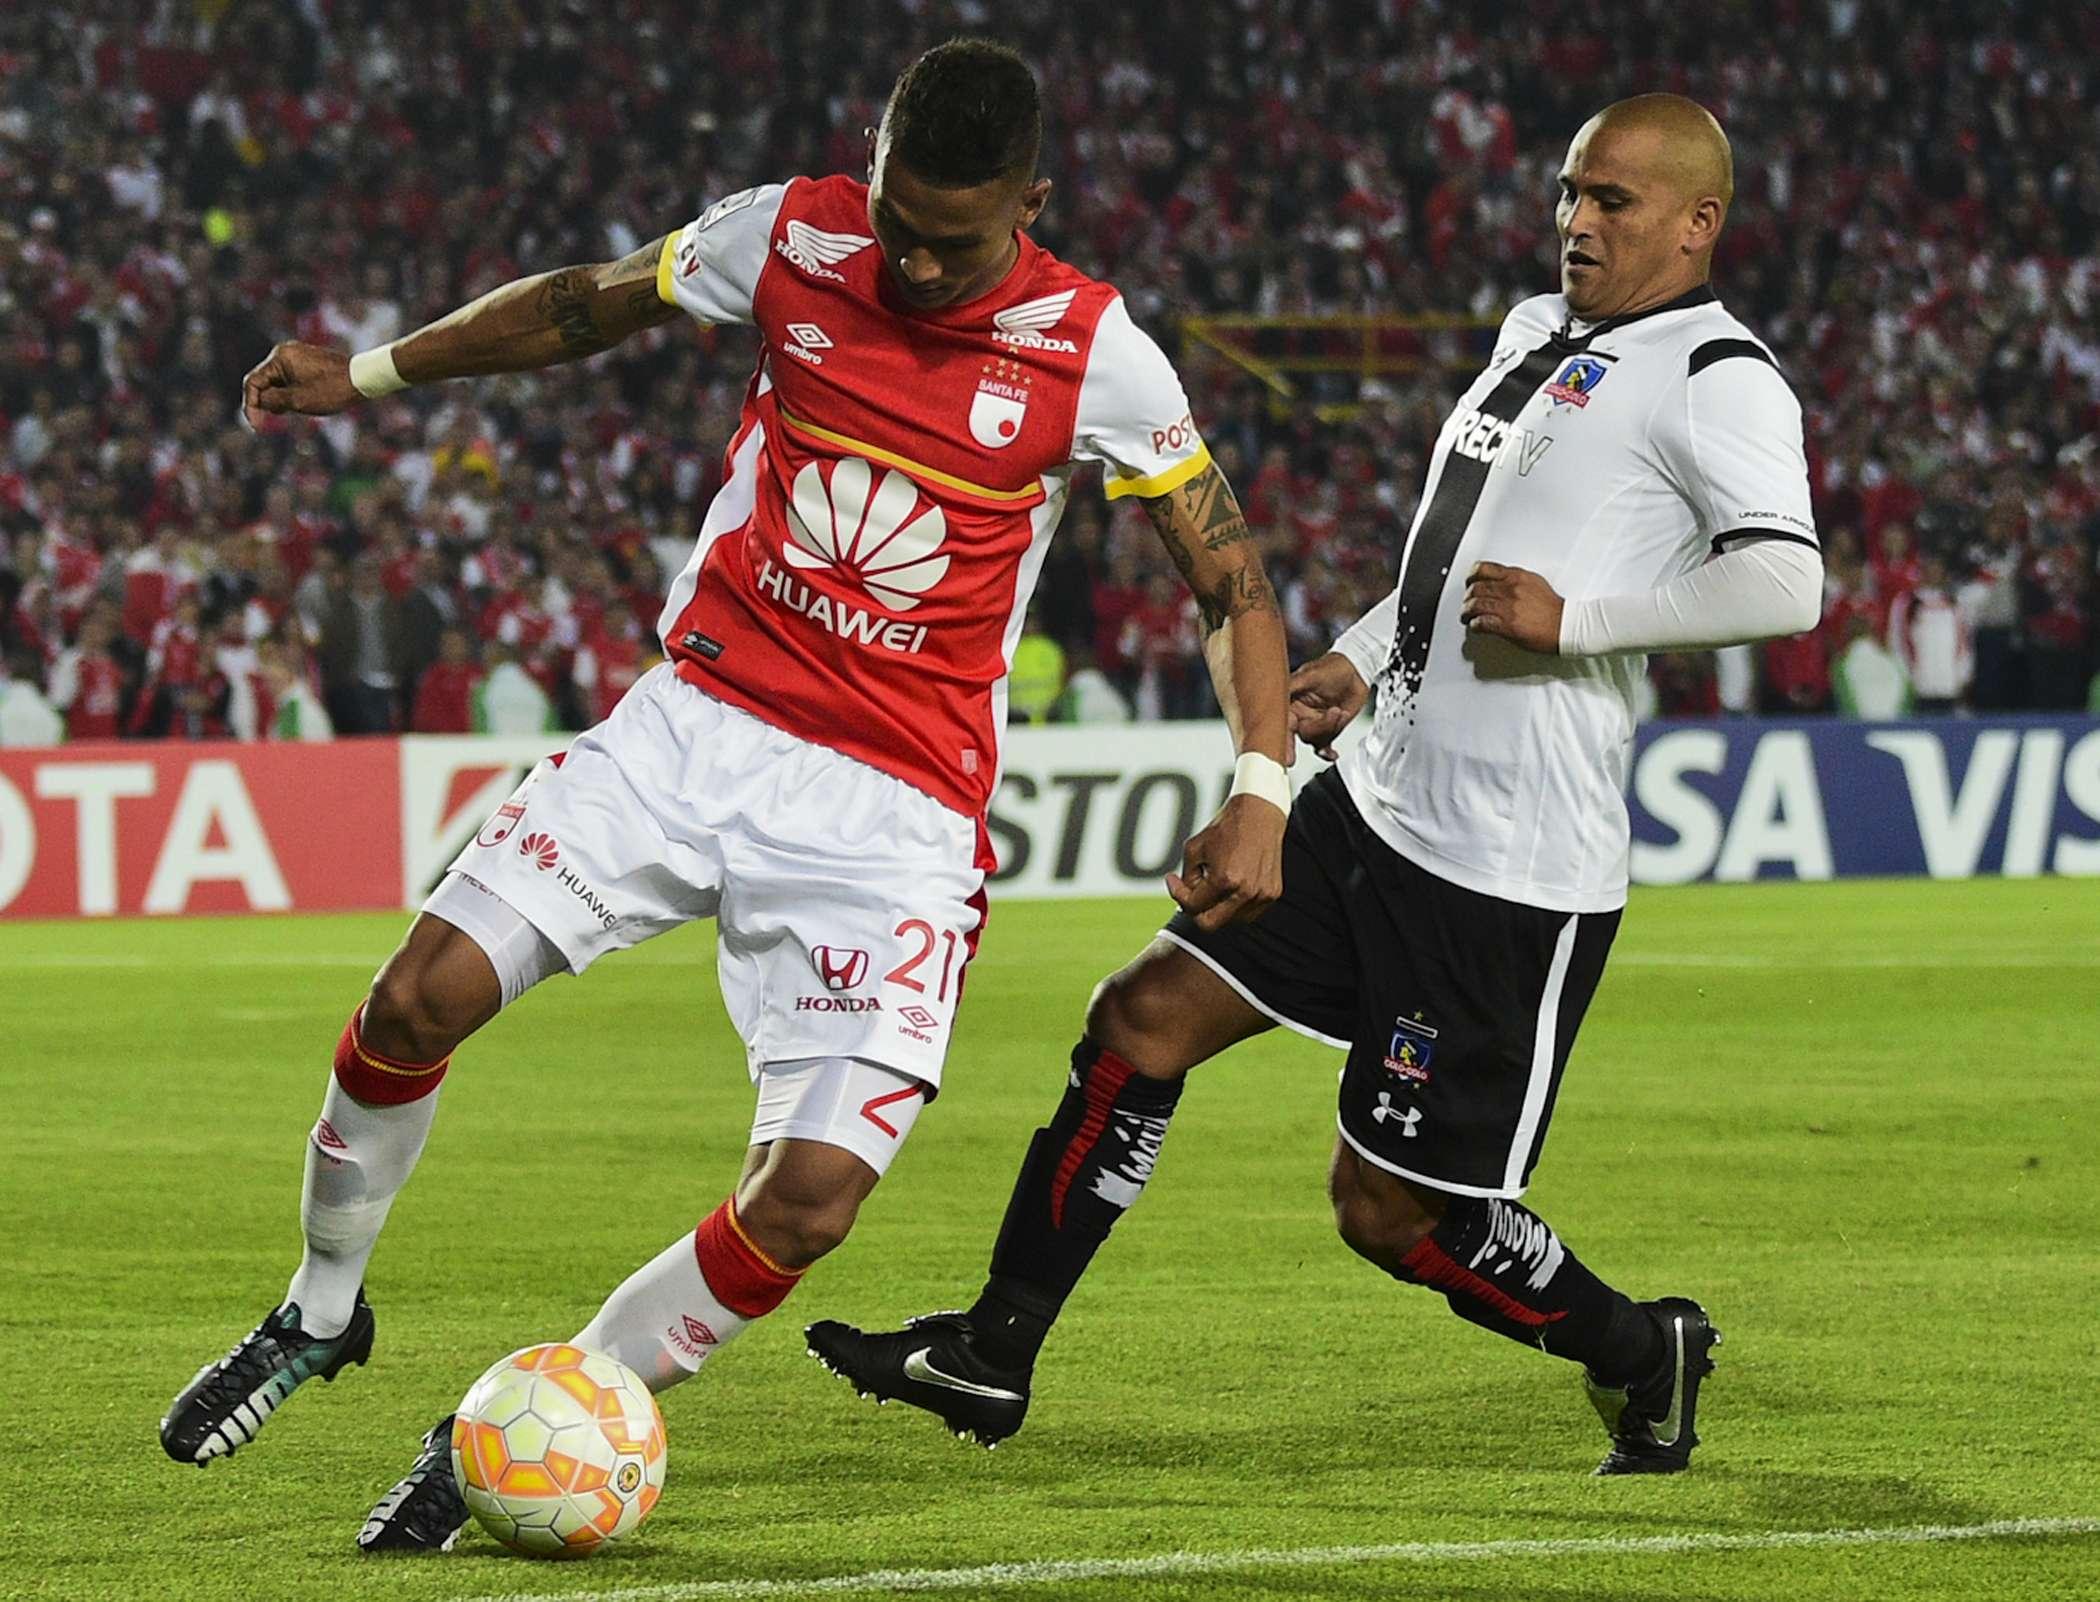 Santa Fe ante Colo Colo por Copa Libertadores. Foto: AFP